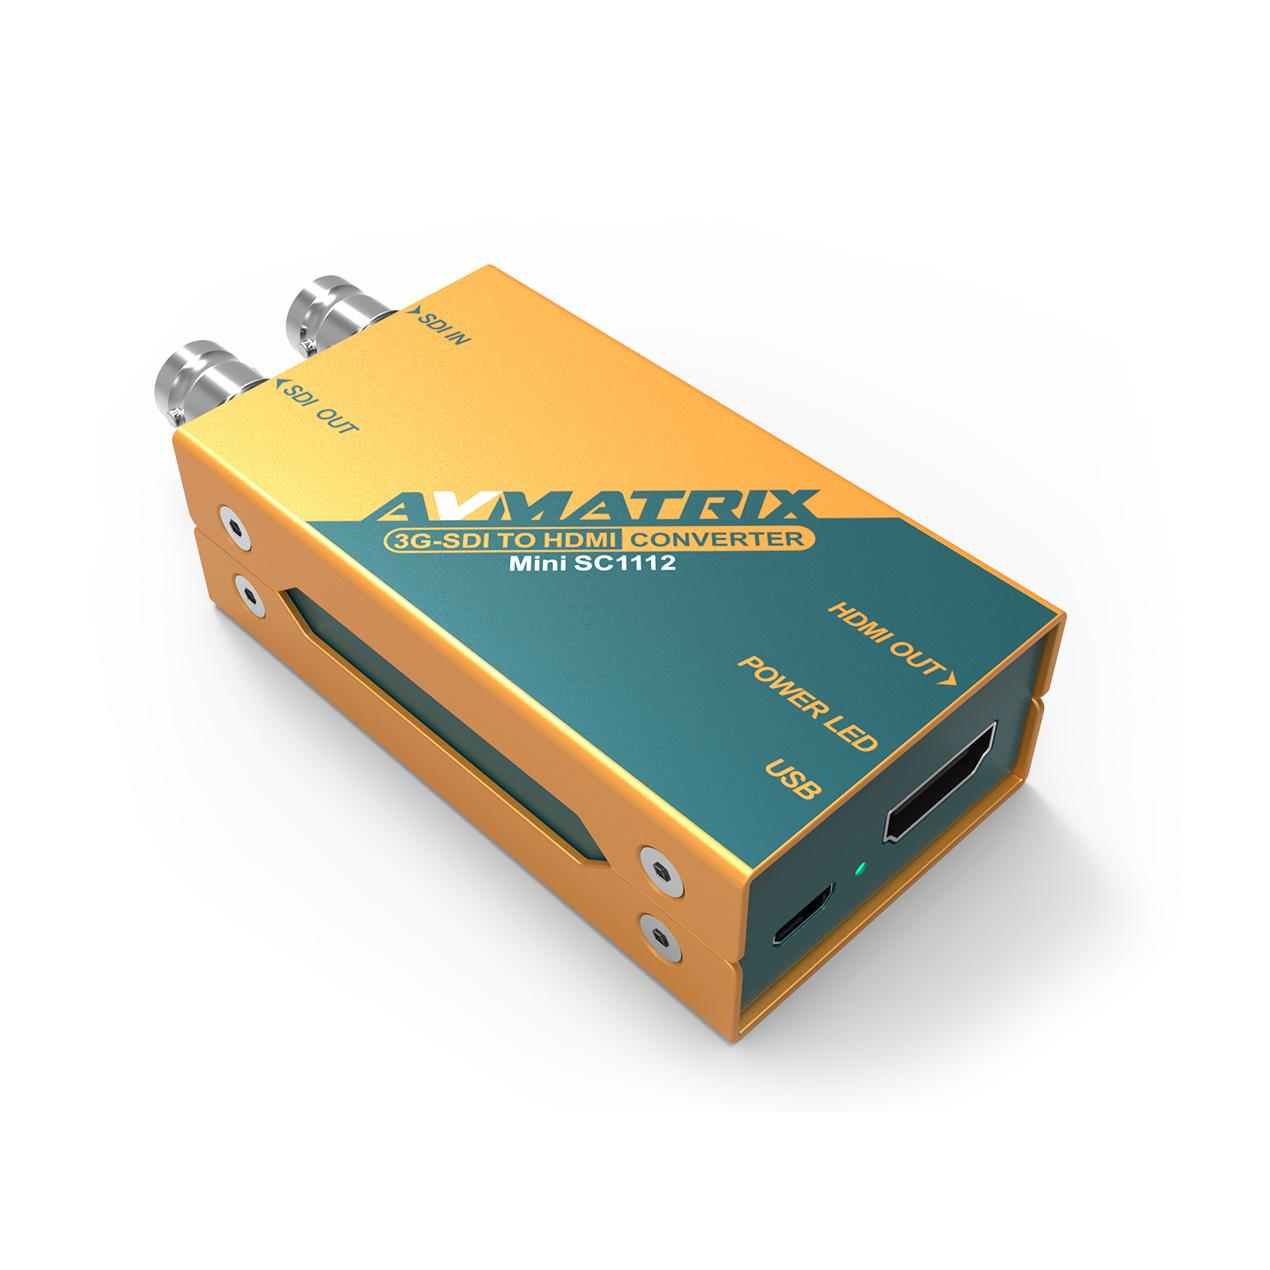 AVMATRIX 3G-SDI to HDMI Pocket-size broadcast Converter 1